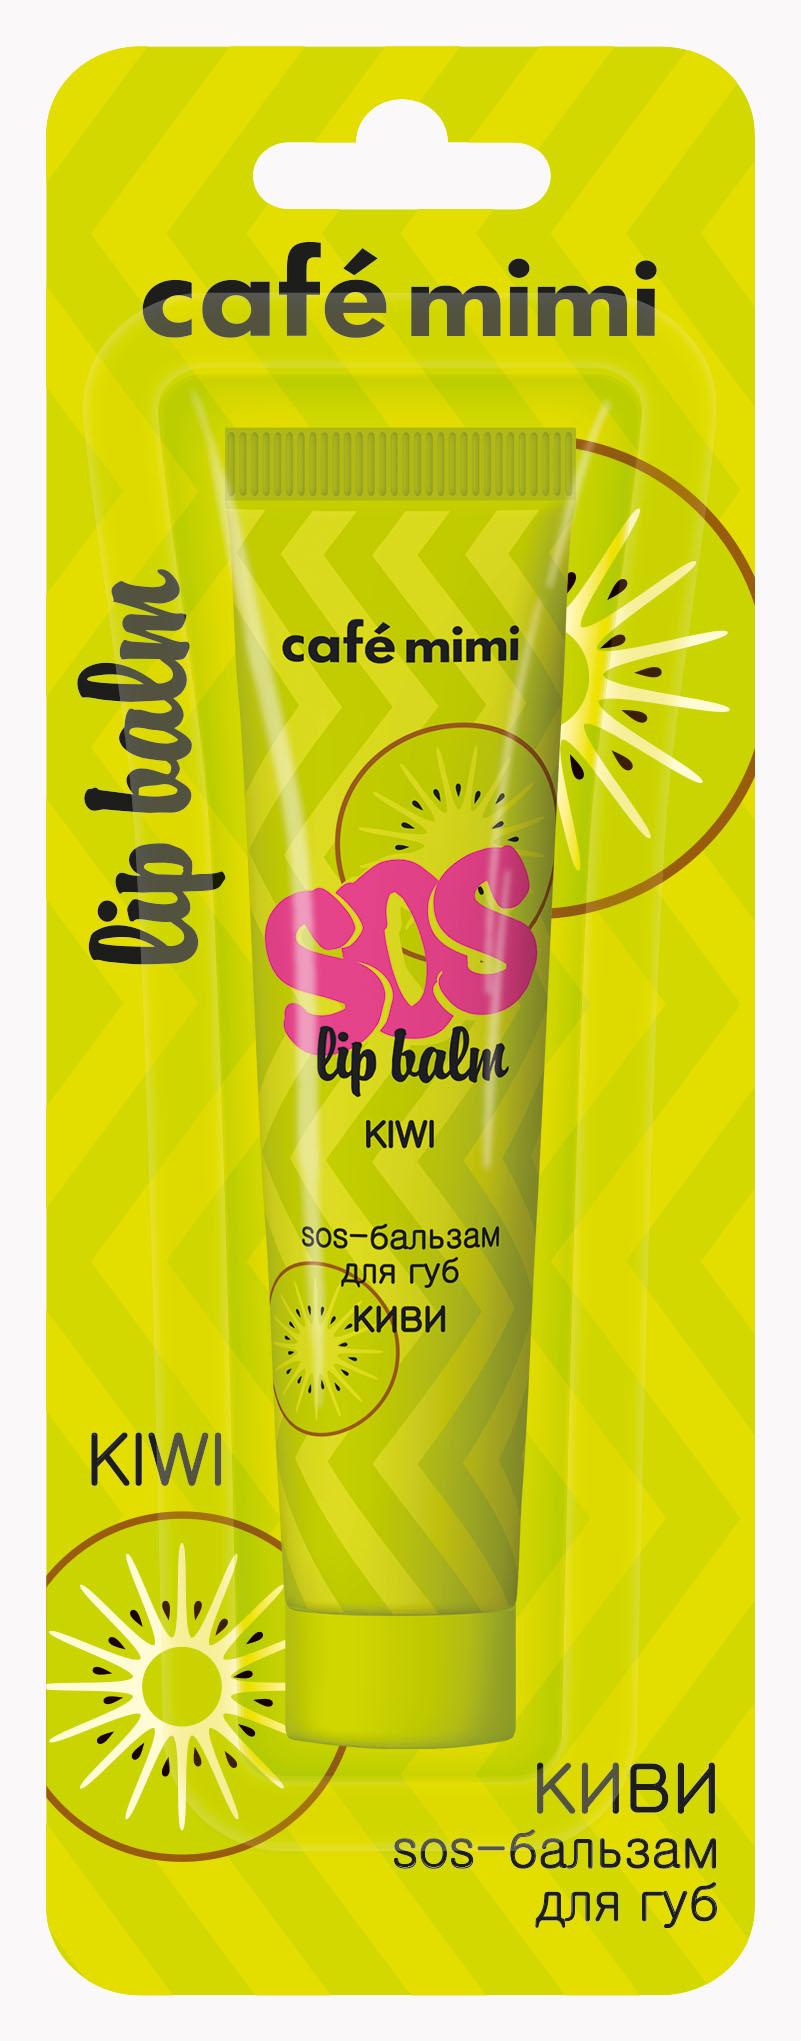 SOS-бальзам для губ КИВИ, 15 мл, CafeMIMI фото